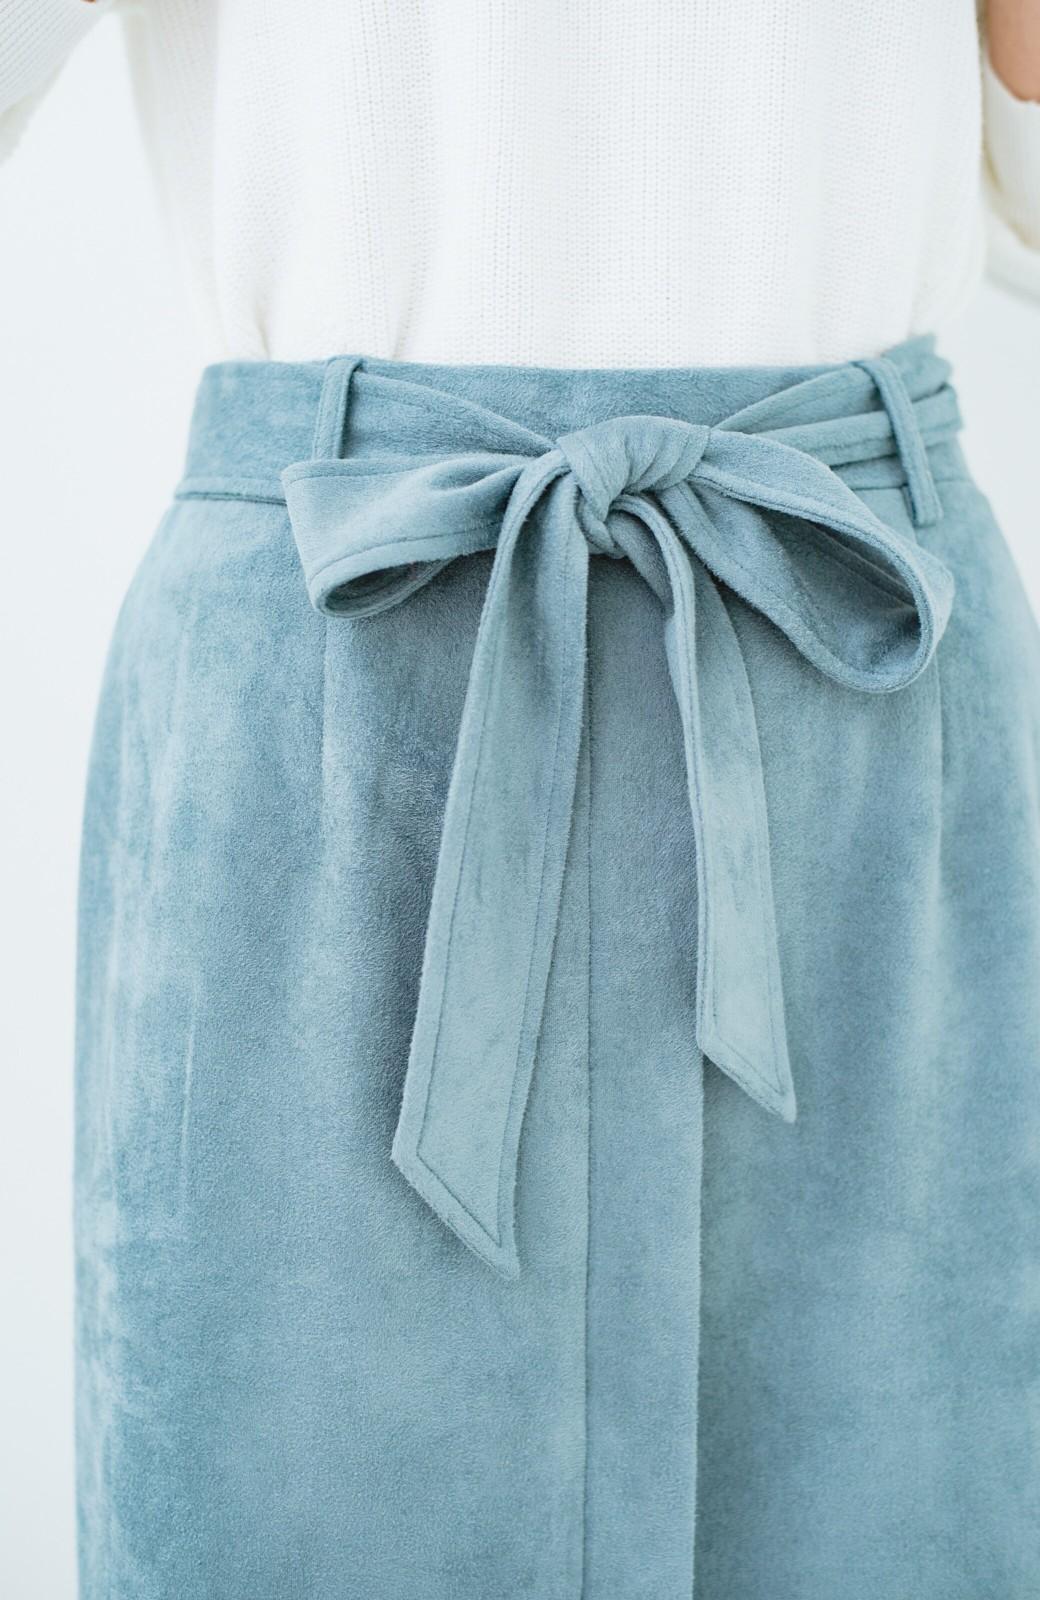 haco! 大人が安心して着られるタイトスカート by que made me <グレイッシュブルー>の商品写真7